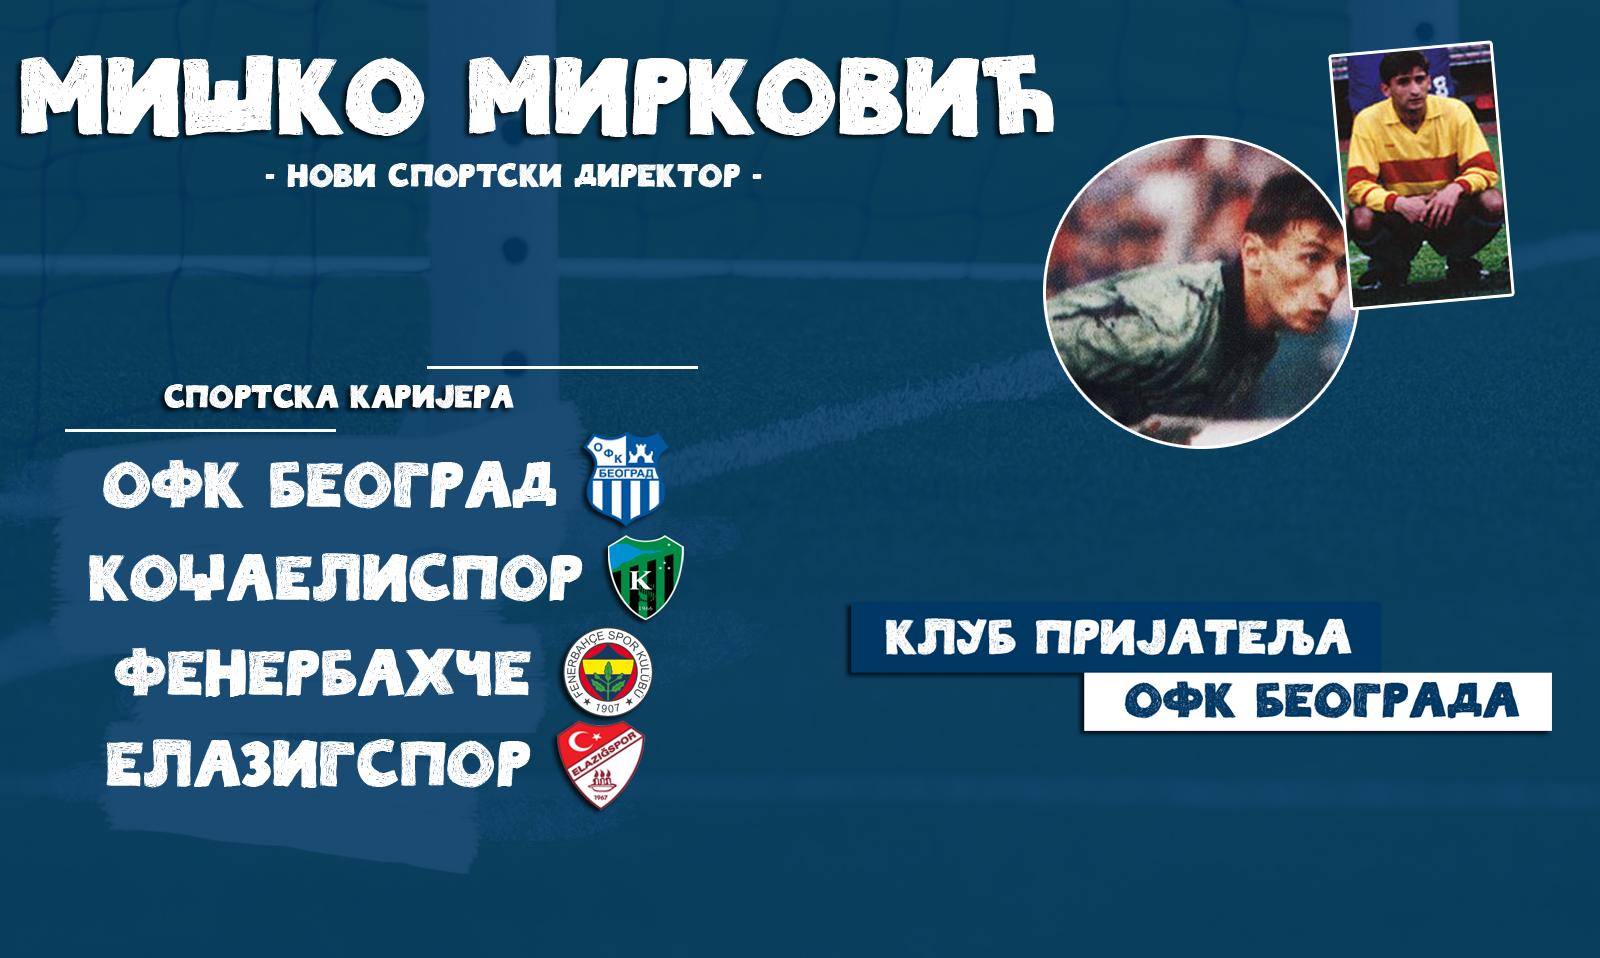 Мишко Мирковић именован за спортског директора